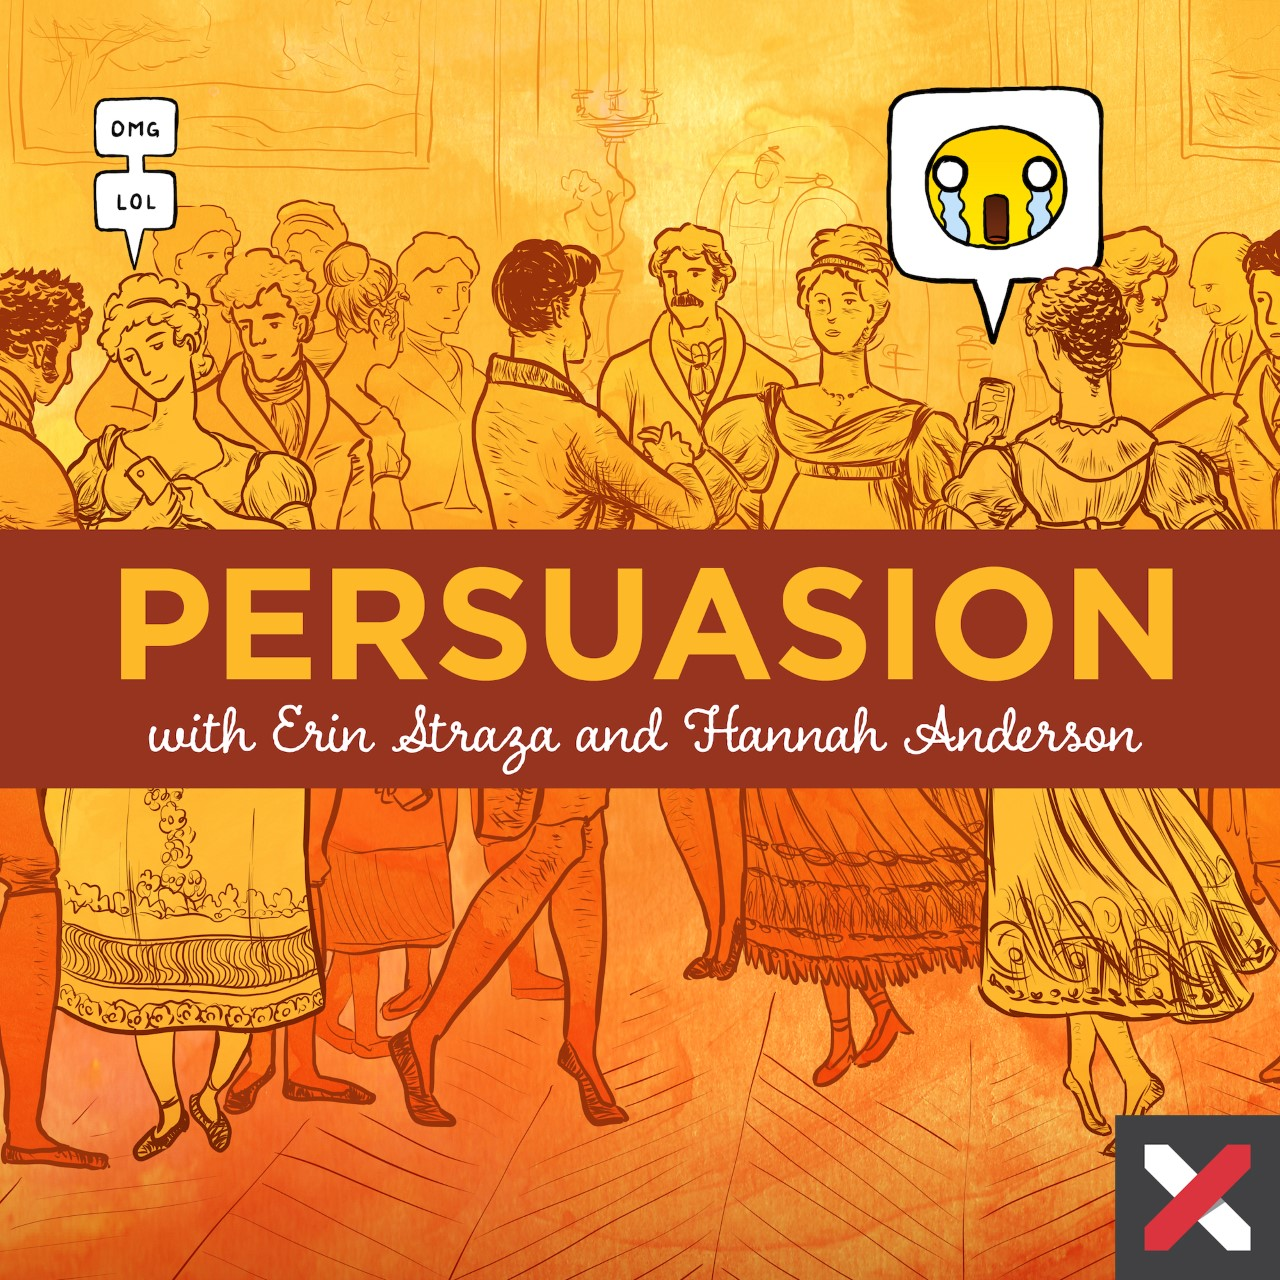 persuasion art.jpg